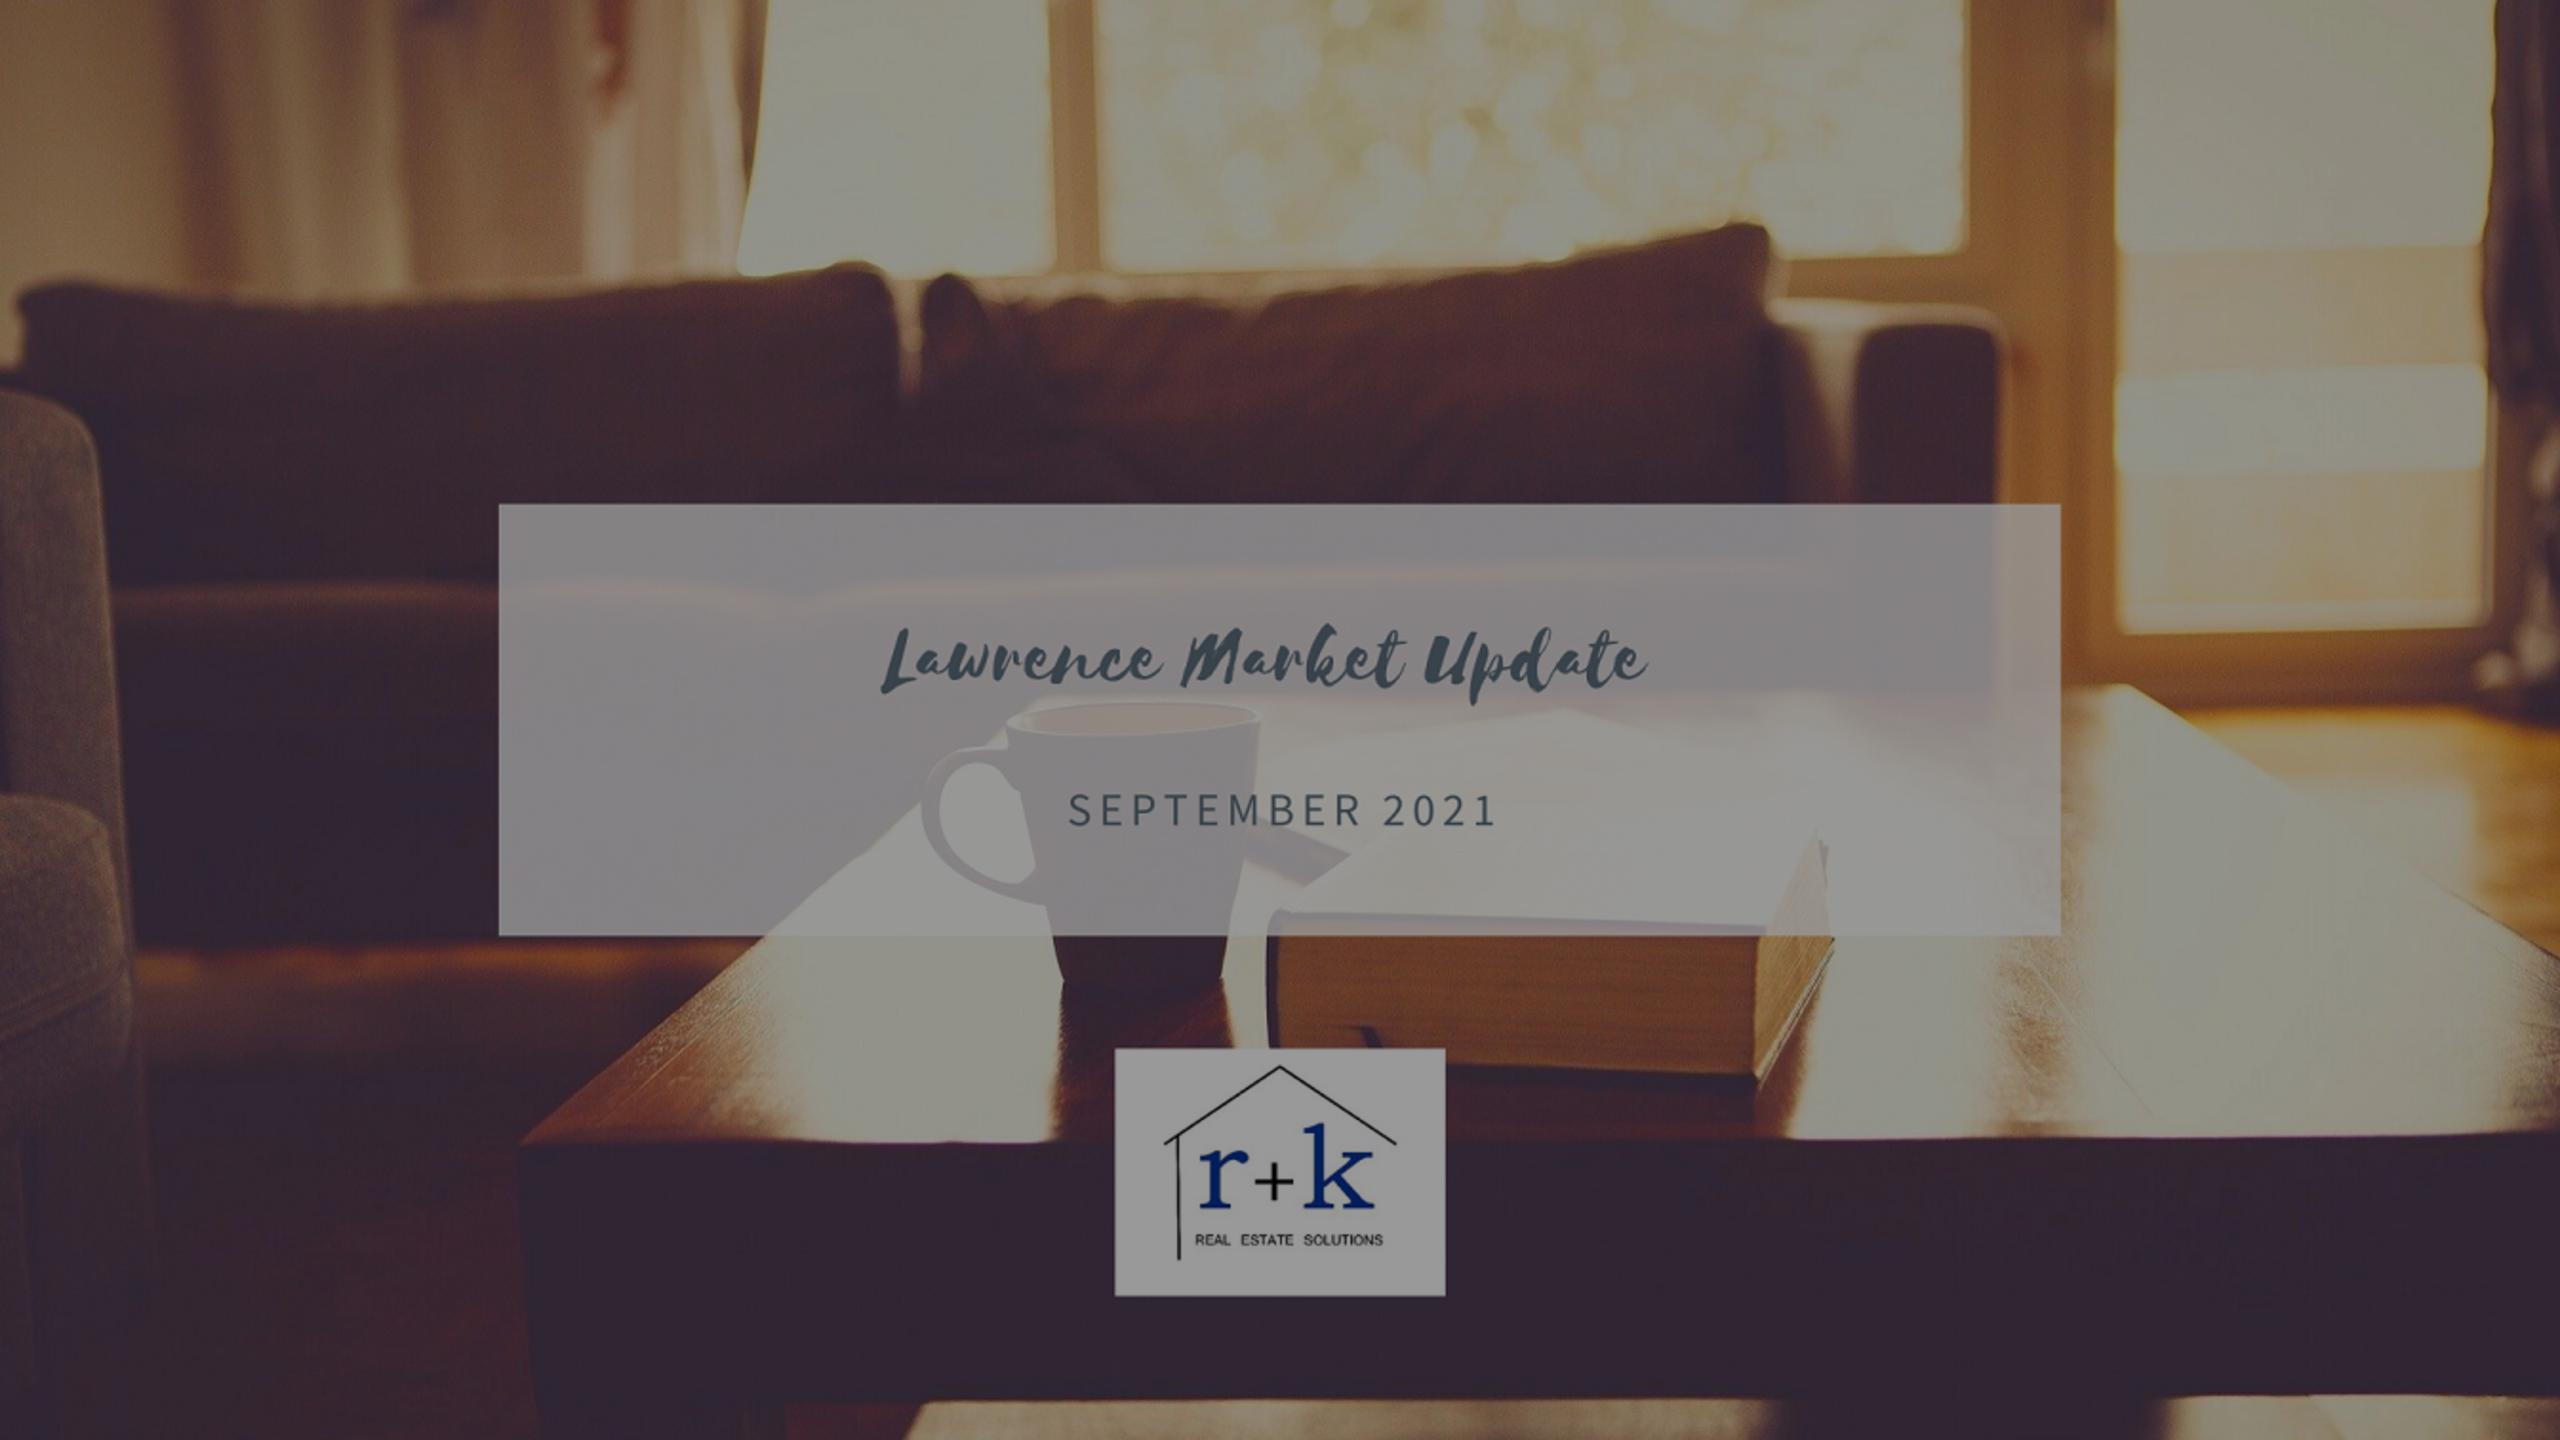 Market Update September 2021